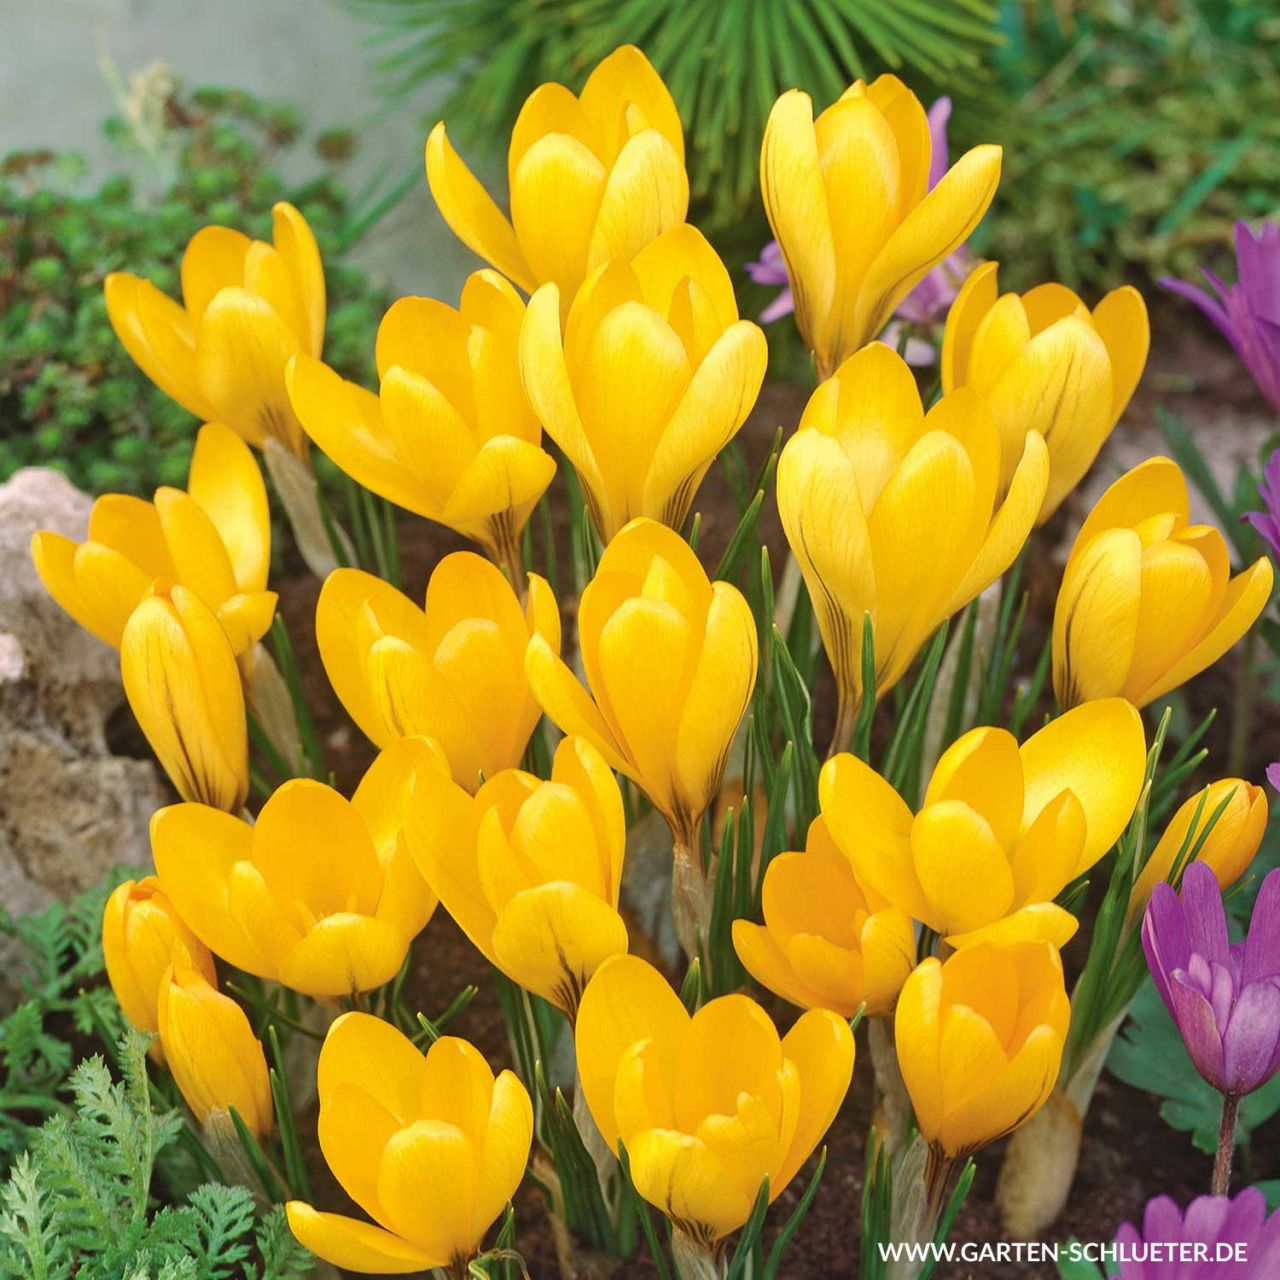 Großblumige Krokusse 'Golden Yellow' - 15 Stück